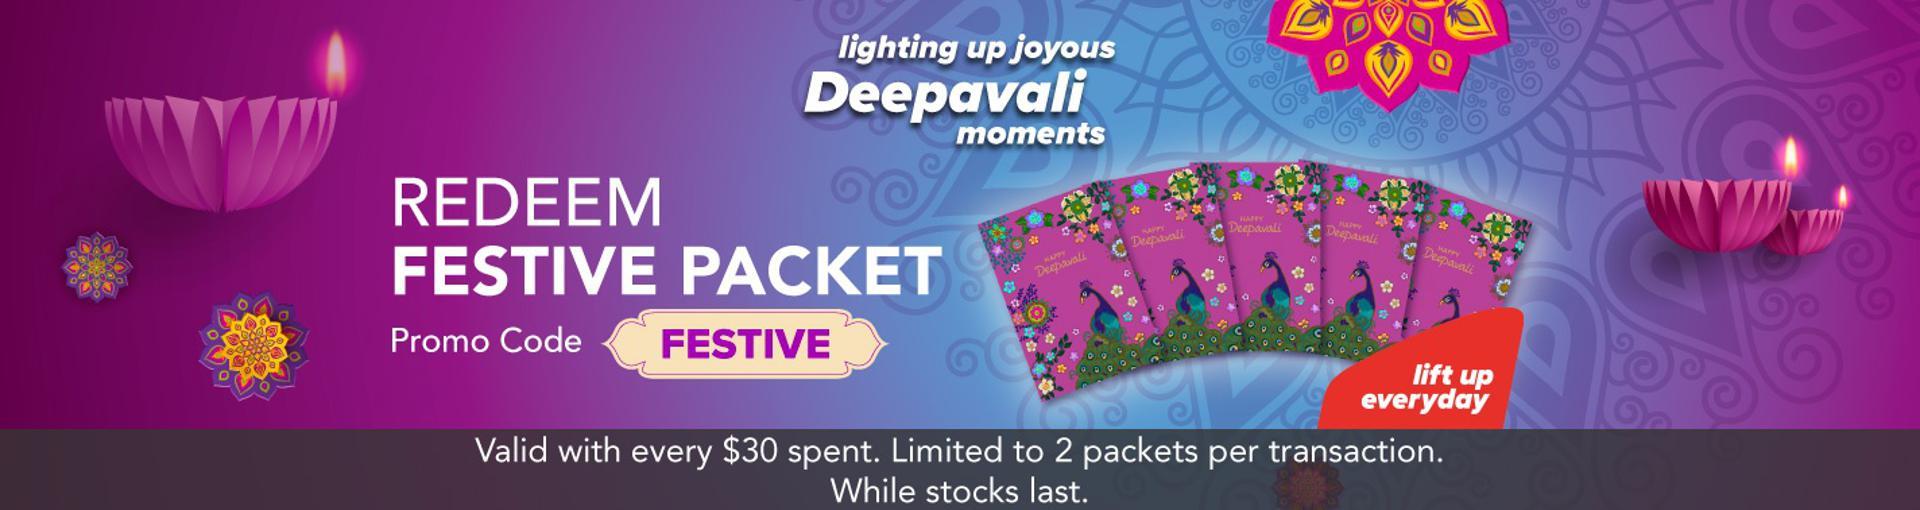 https://media.nedigital.sg/fairprice/images/637947bc-06f1-4095-b78d-d2de585d99bf/Deepavali-FestivePackets-LandingBanner-Oct2021.jpg